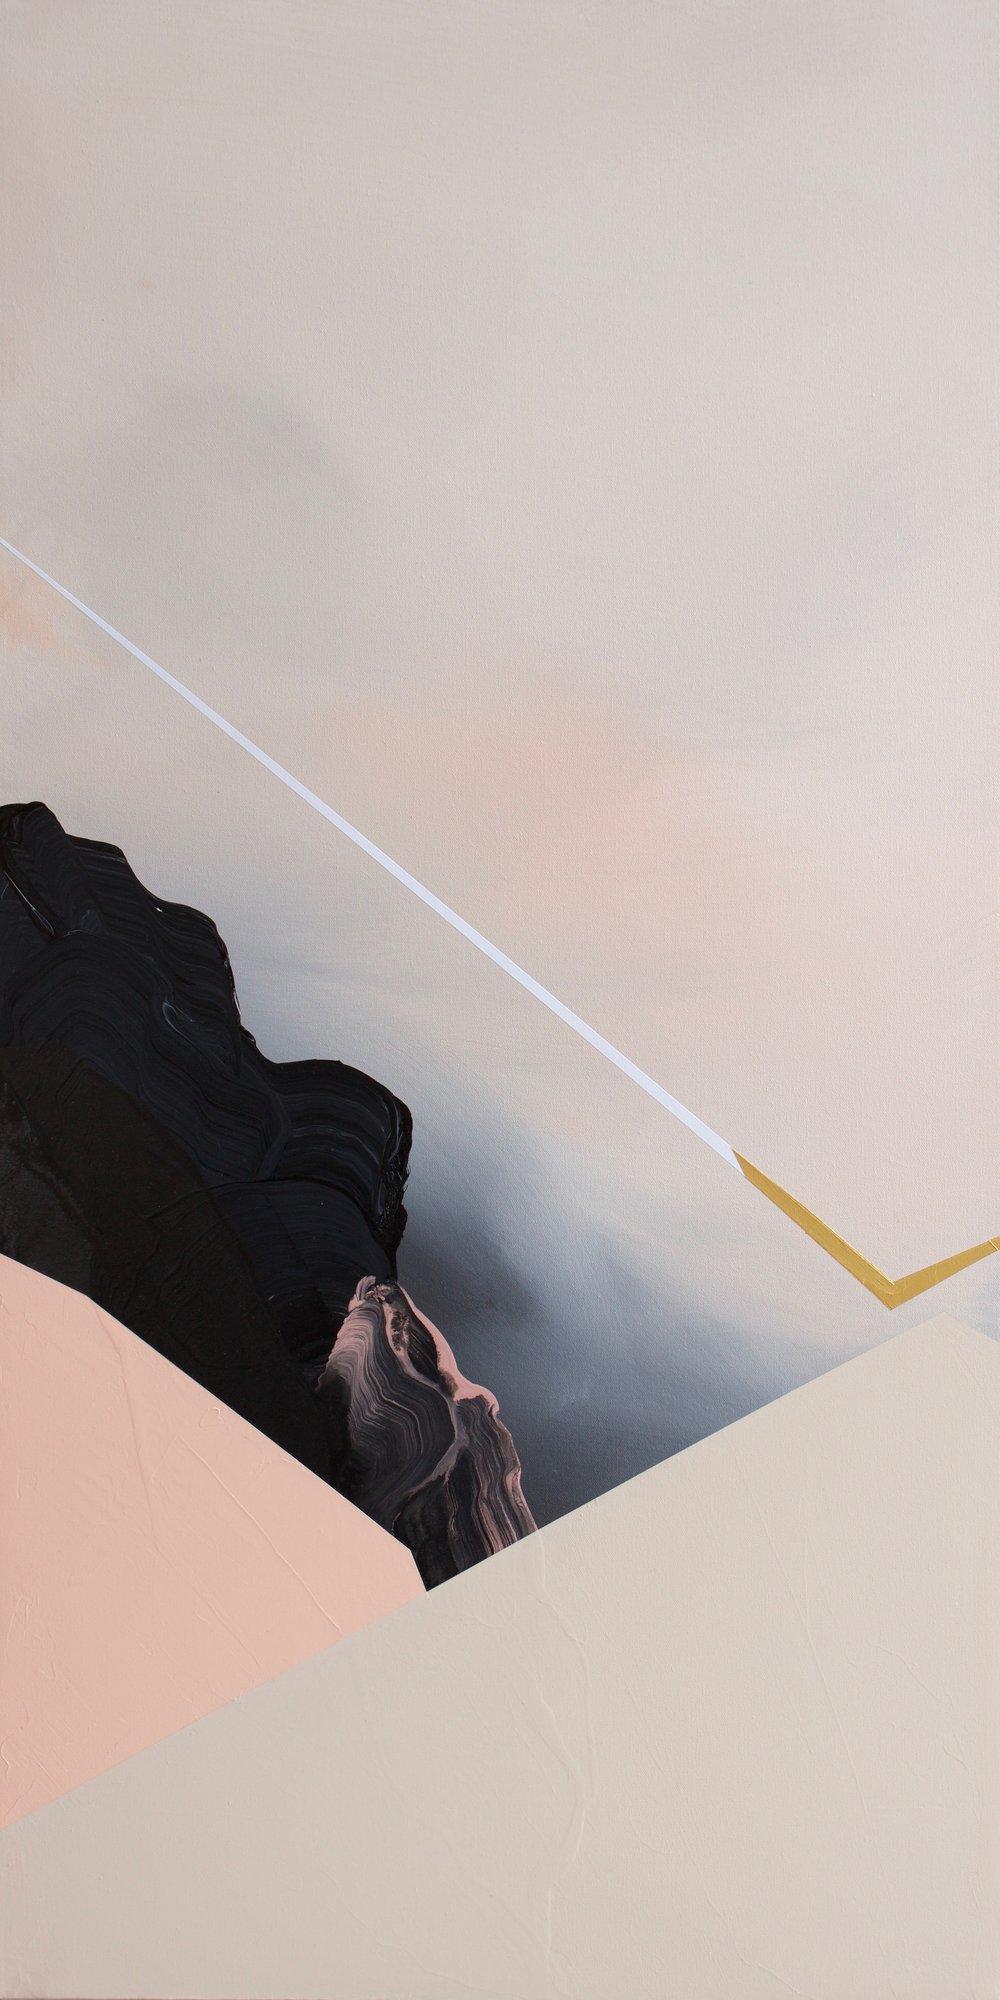 On The Edge  Mixed acrylic medium on canvas 48x24 inches $900.00